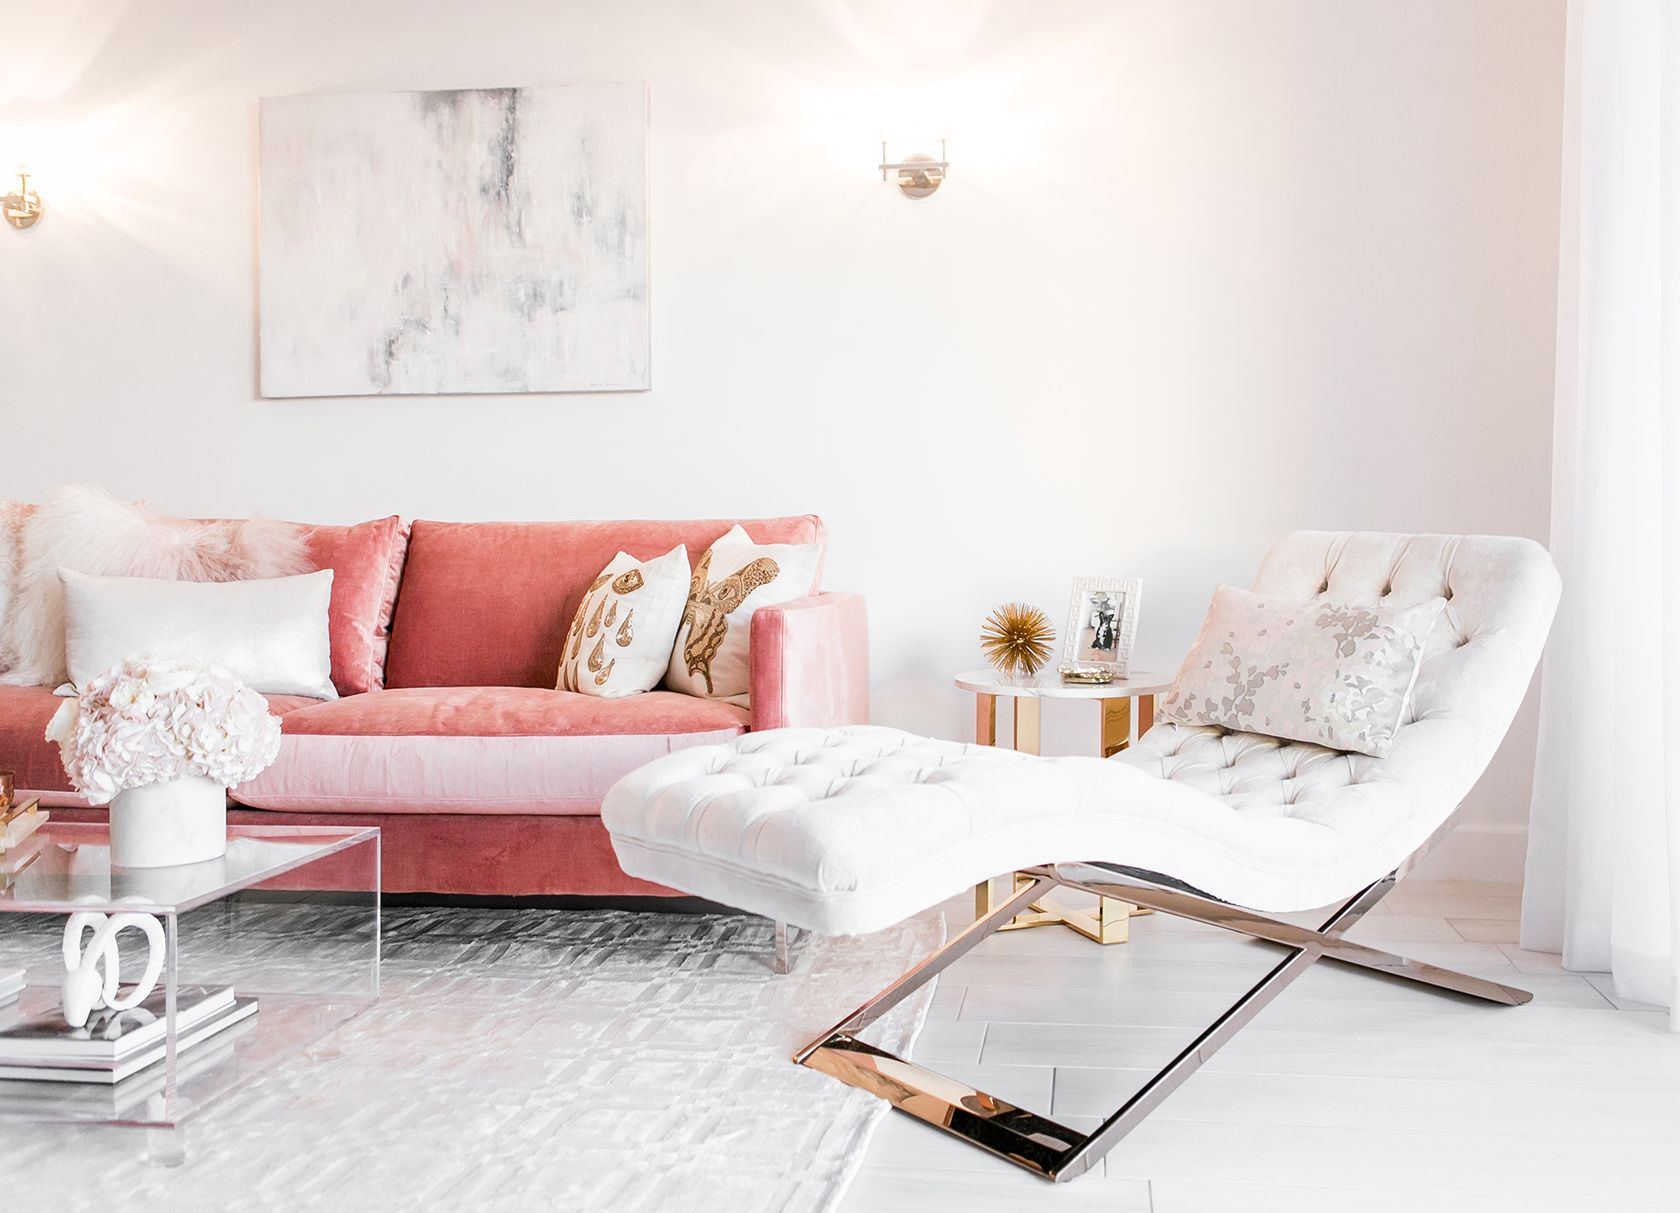 ne Style shows glam living room decor with velvet chaise #home ...